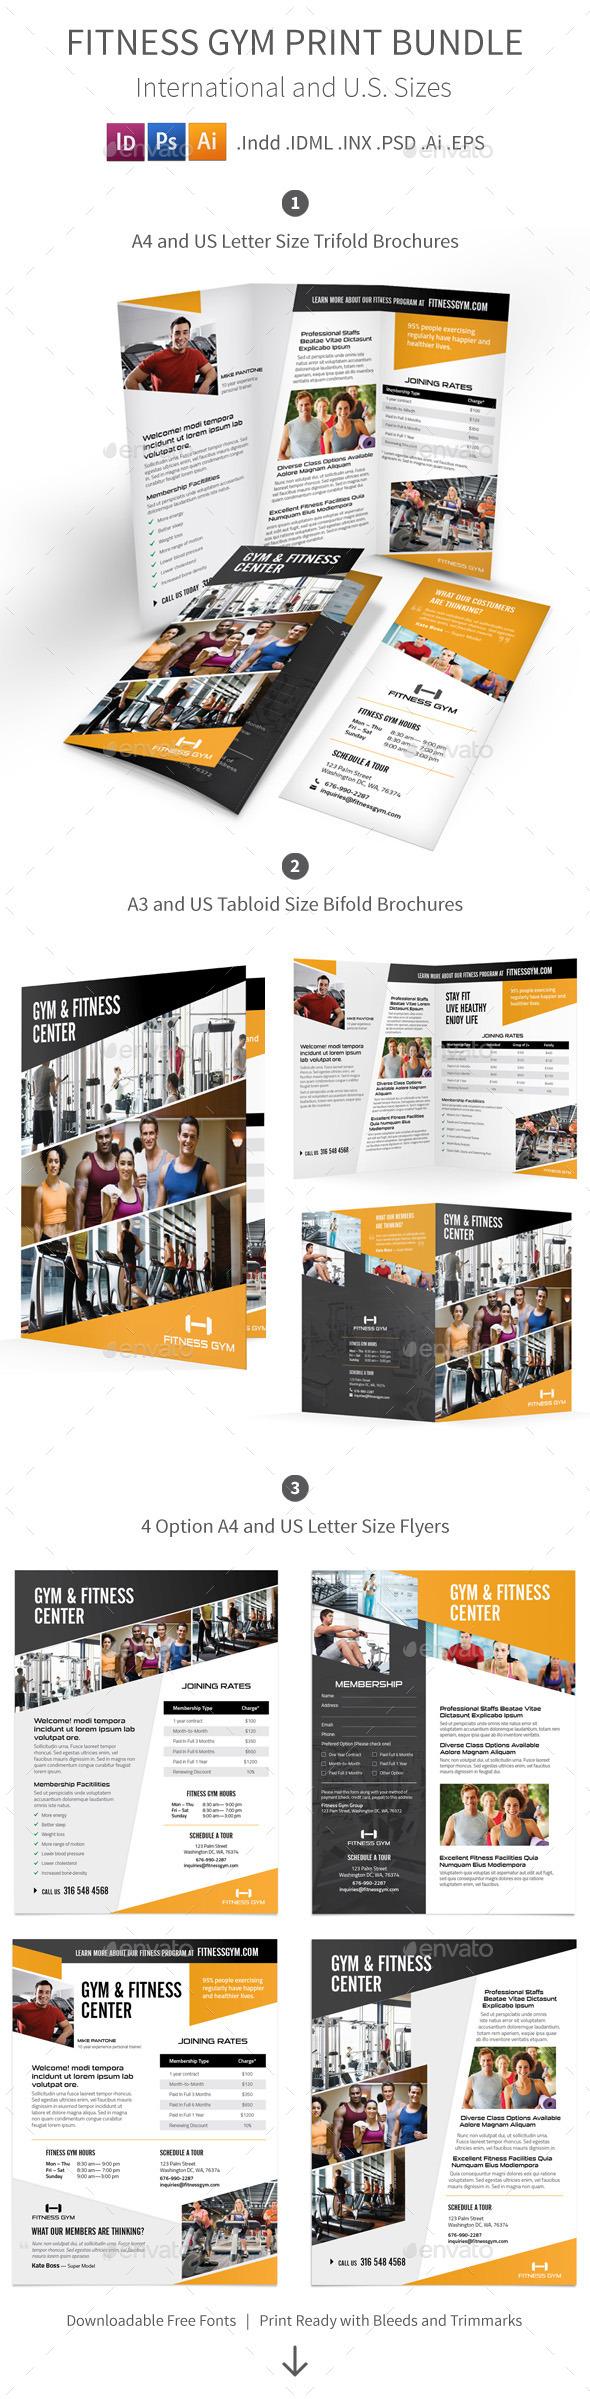 GraphicRiver Fitness Gym Print Bundle 8844134